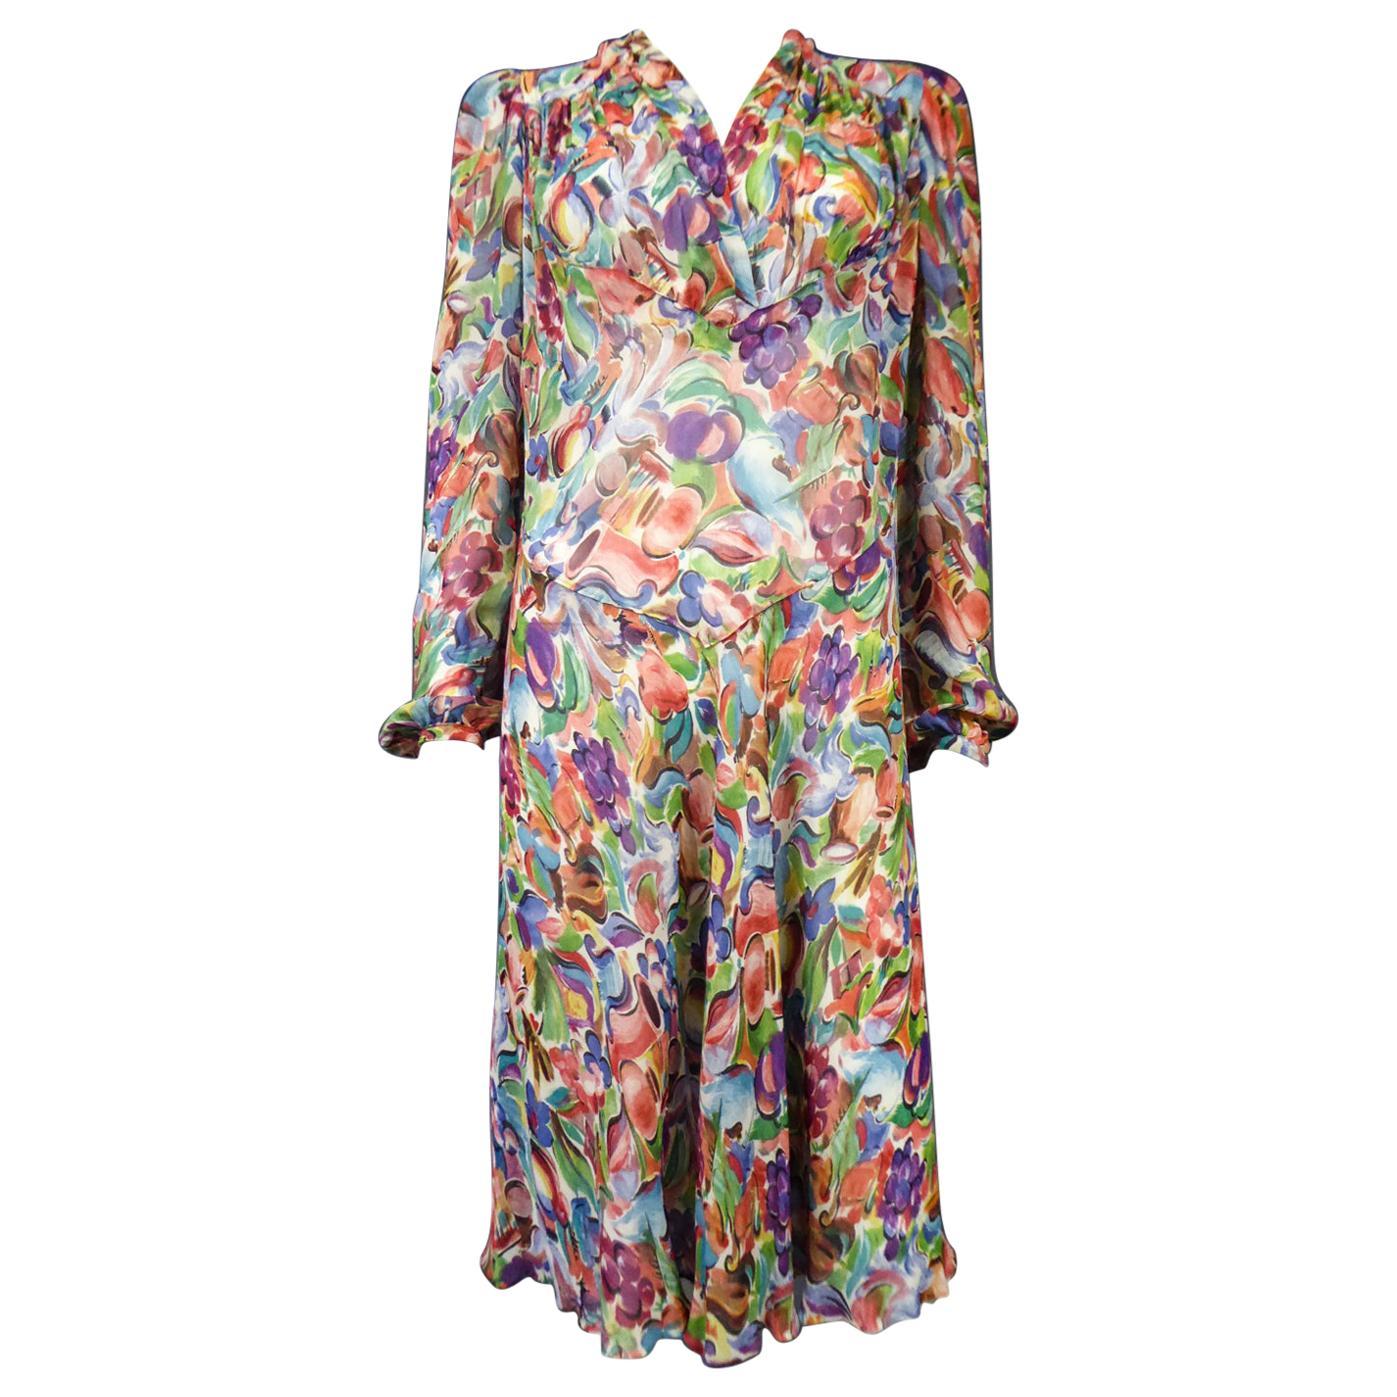 A French Printed Silk Crepe Dress Raoul Dufy inspiration Circa 1940